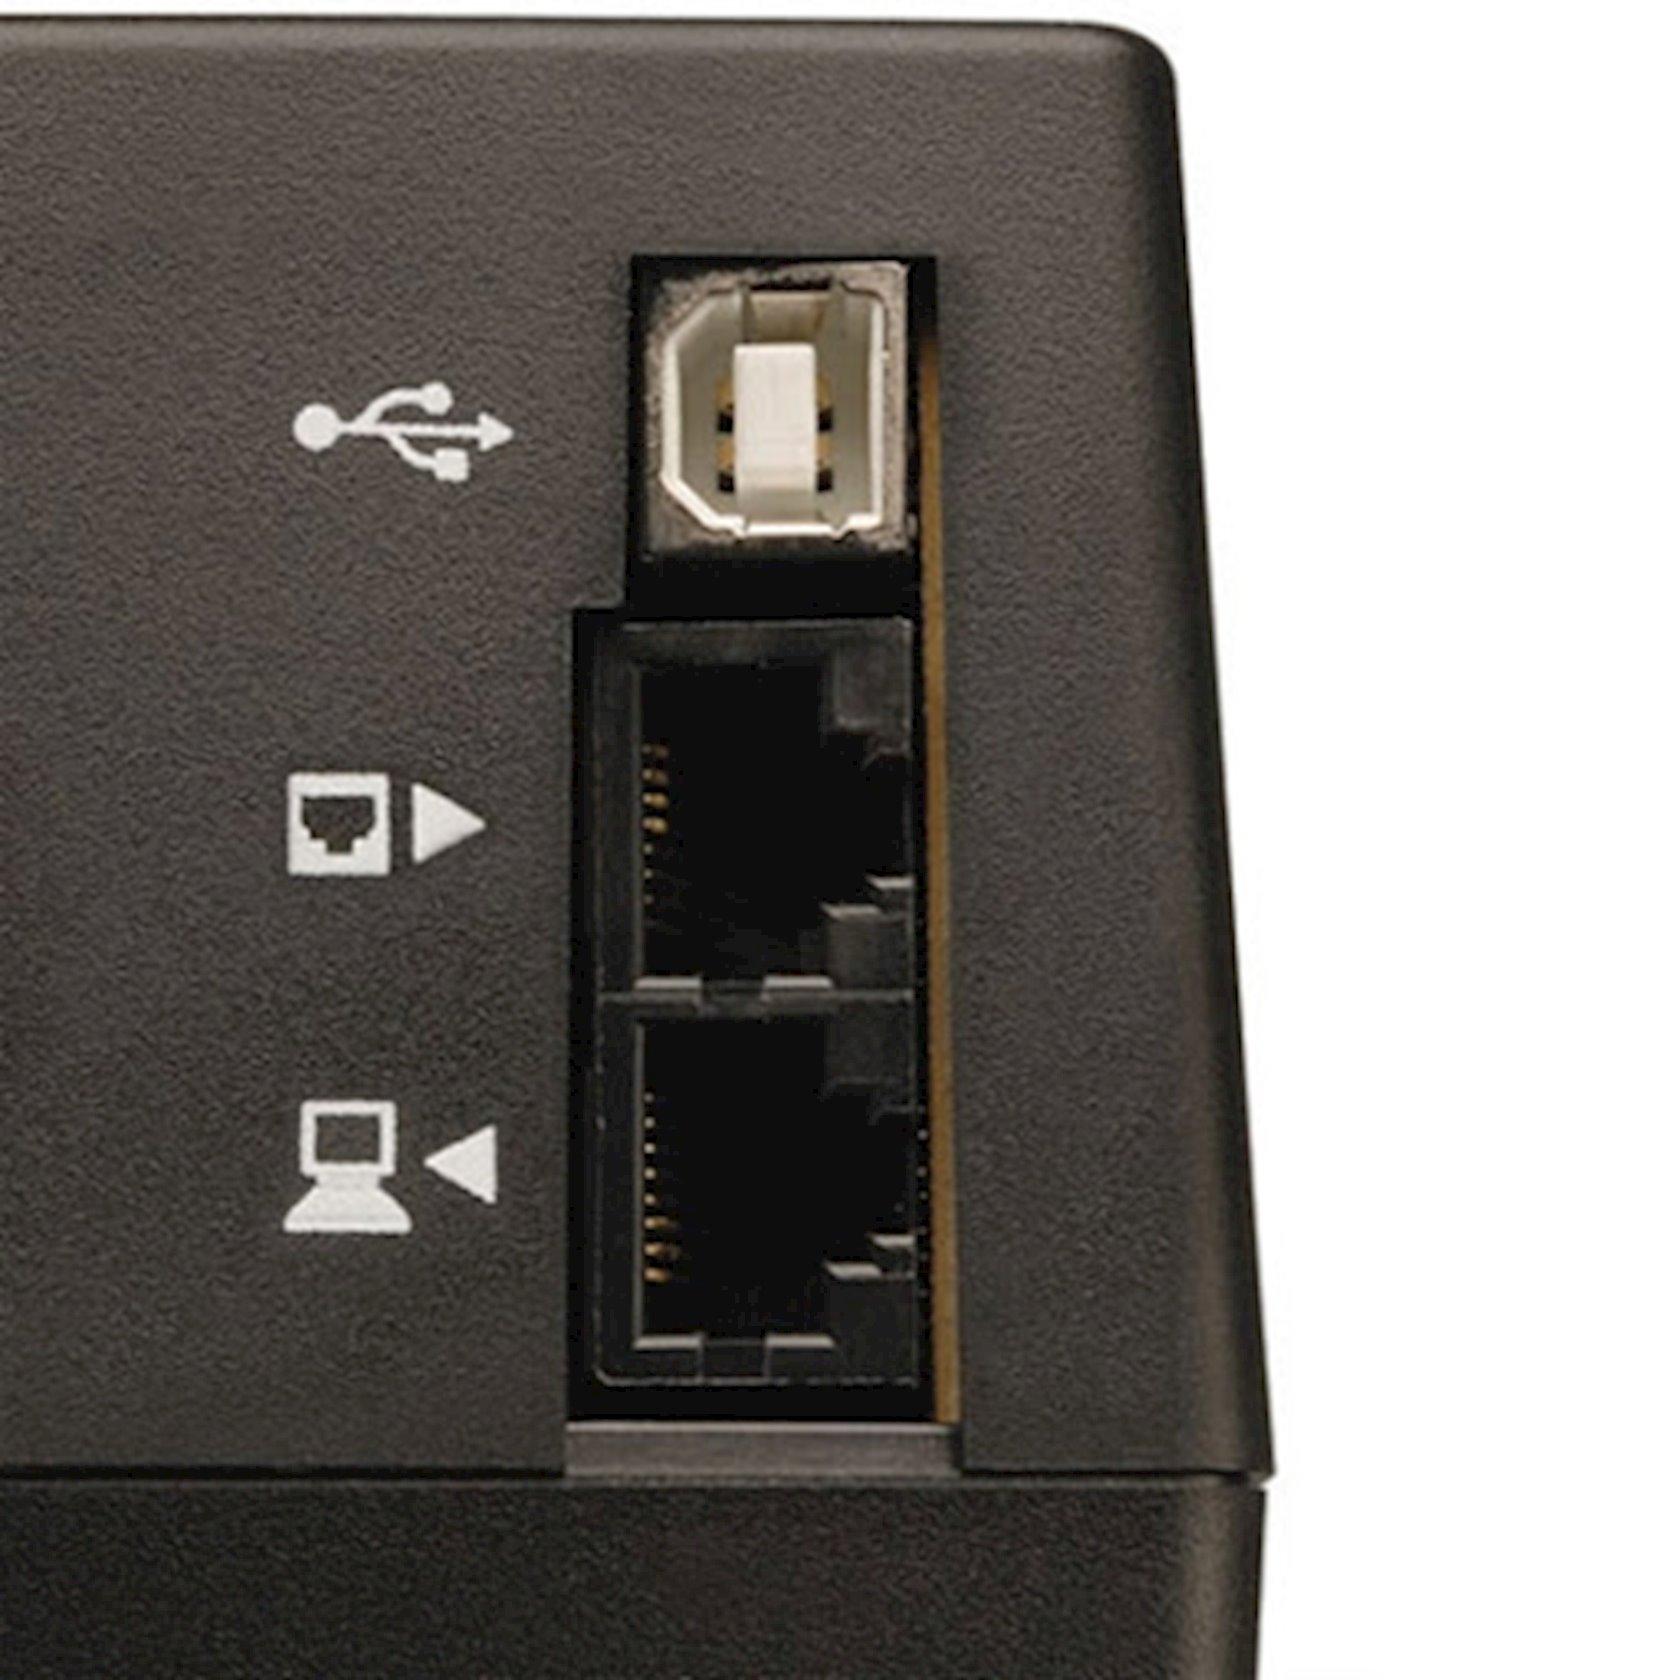 UPS Tripp Lite Lite Internet AVRX750UD